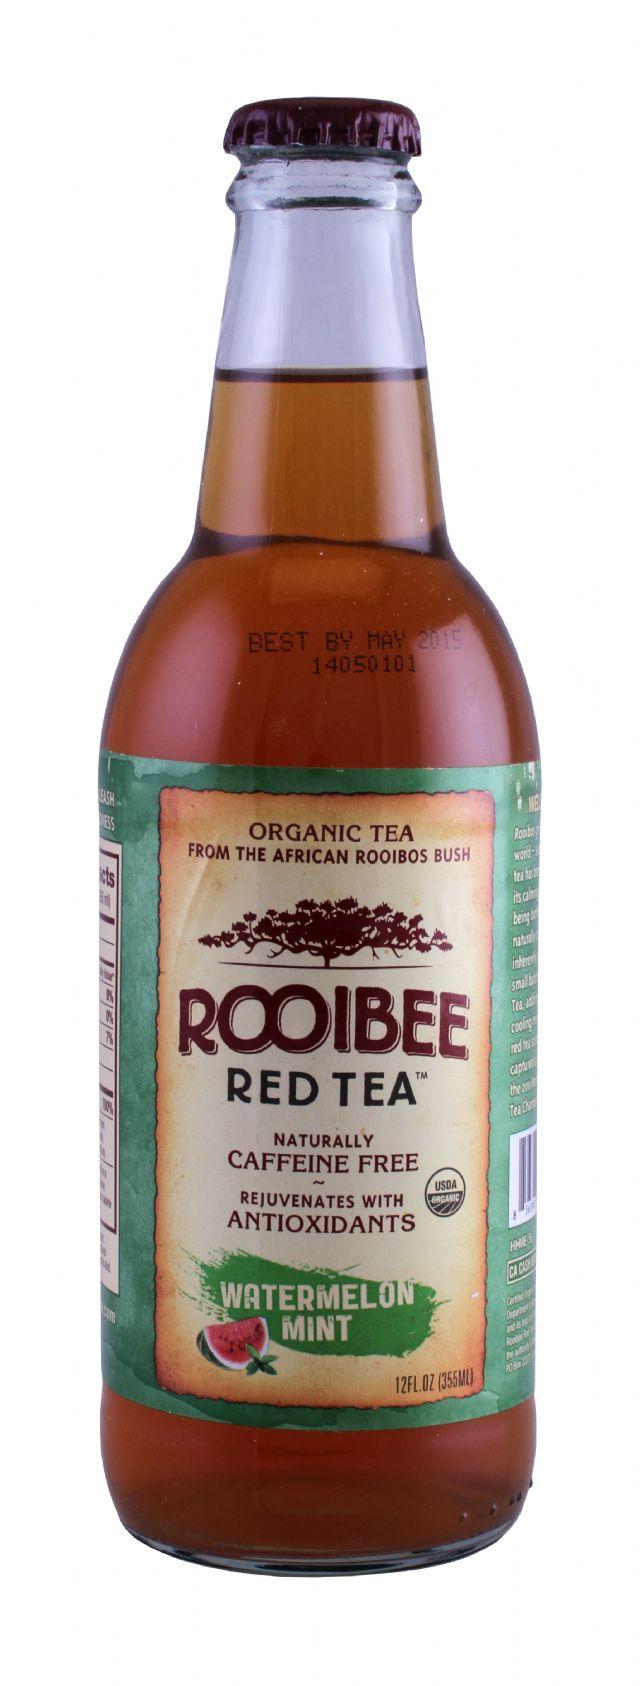 Rooibee Red Tea: Rooibee WaterMint Front